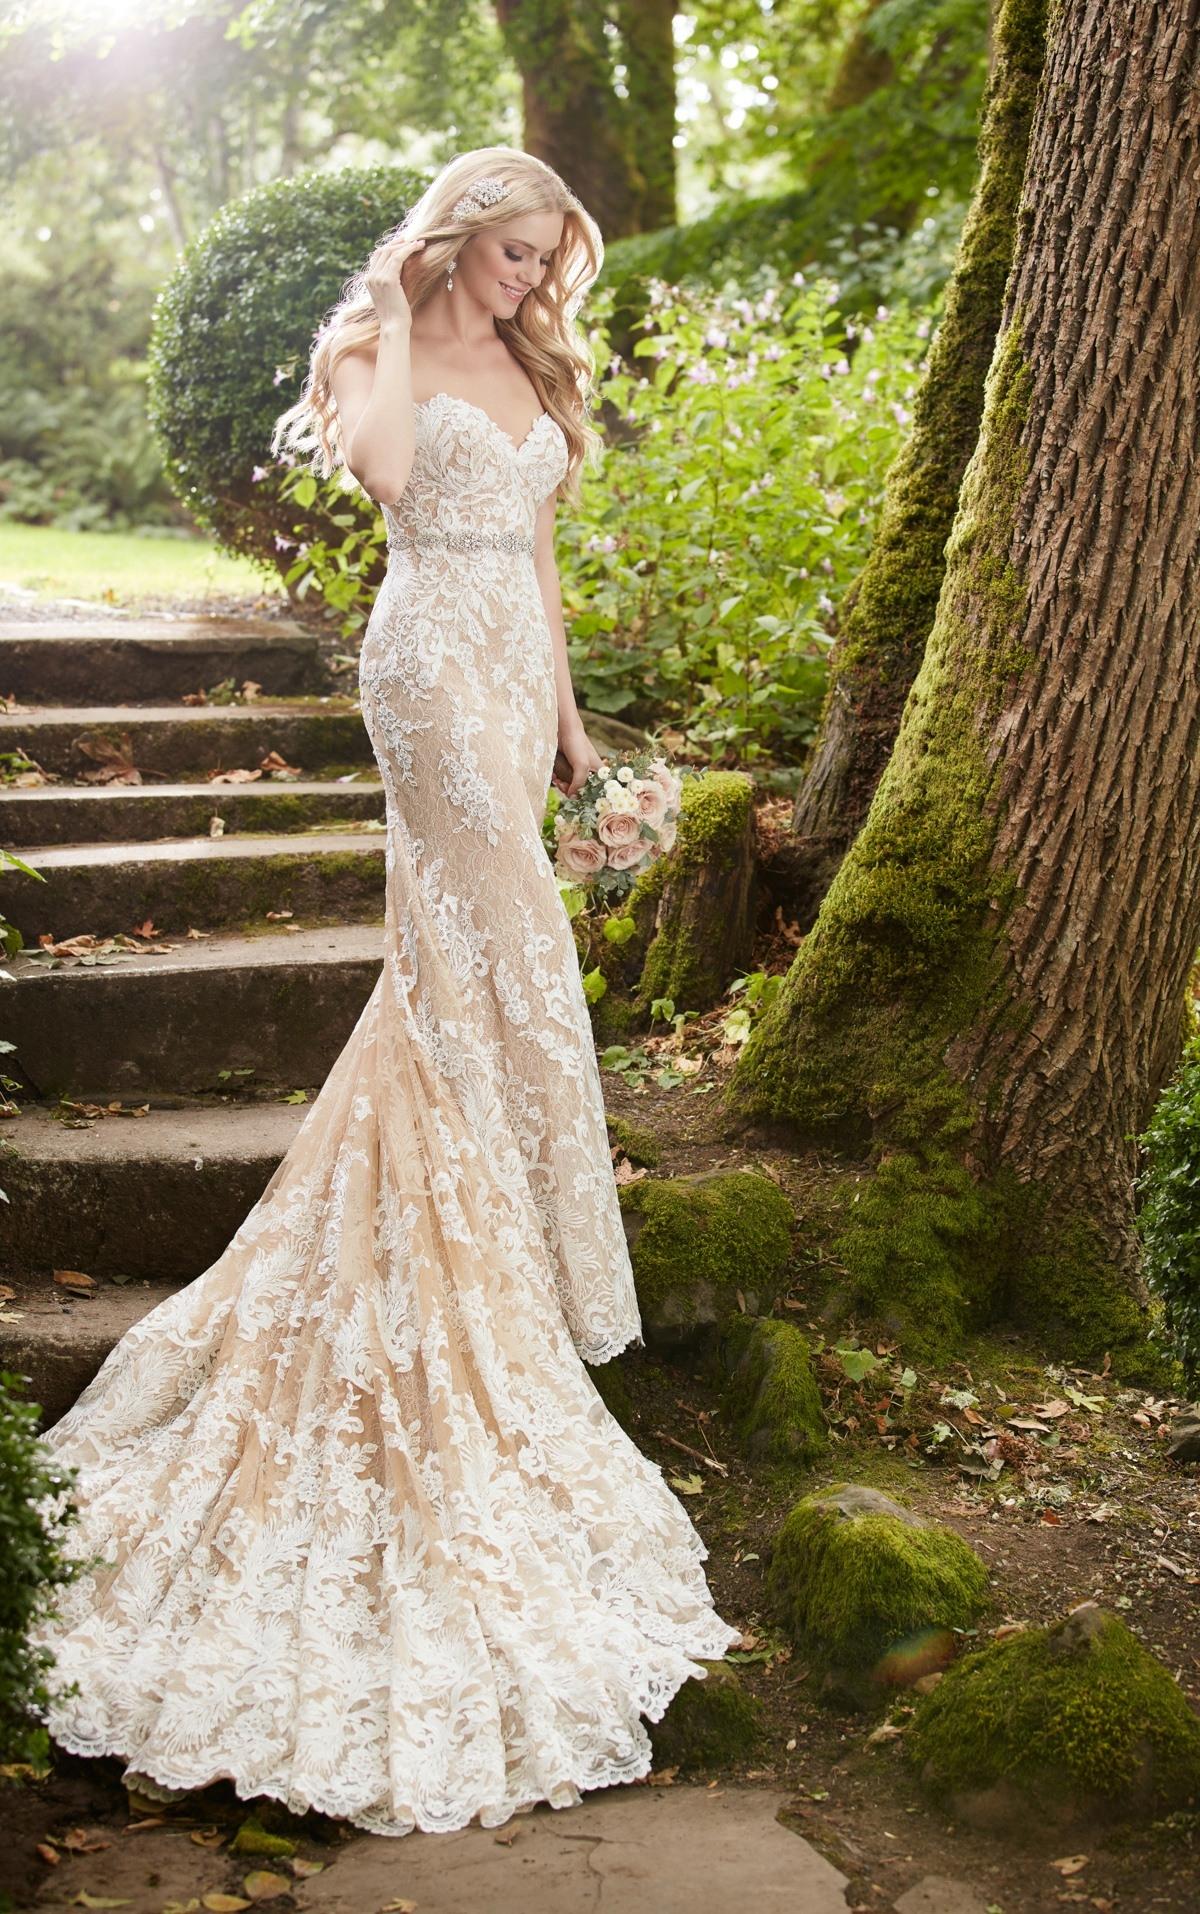 13 Wunderbar Exklusive Brautmode Stylish Spektakulär Exklusive Brautmode Galerie